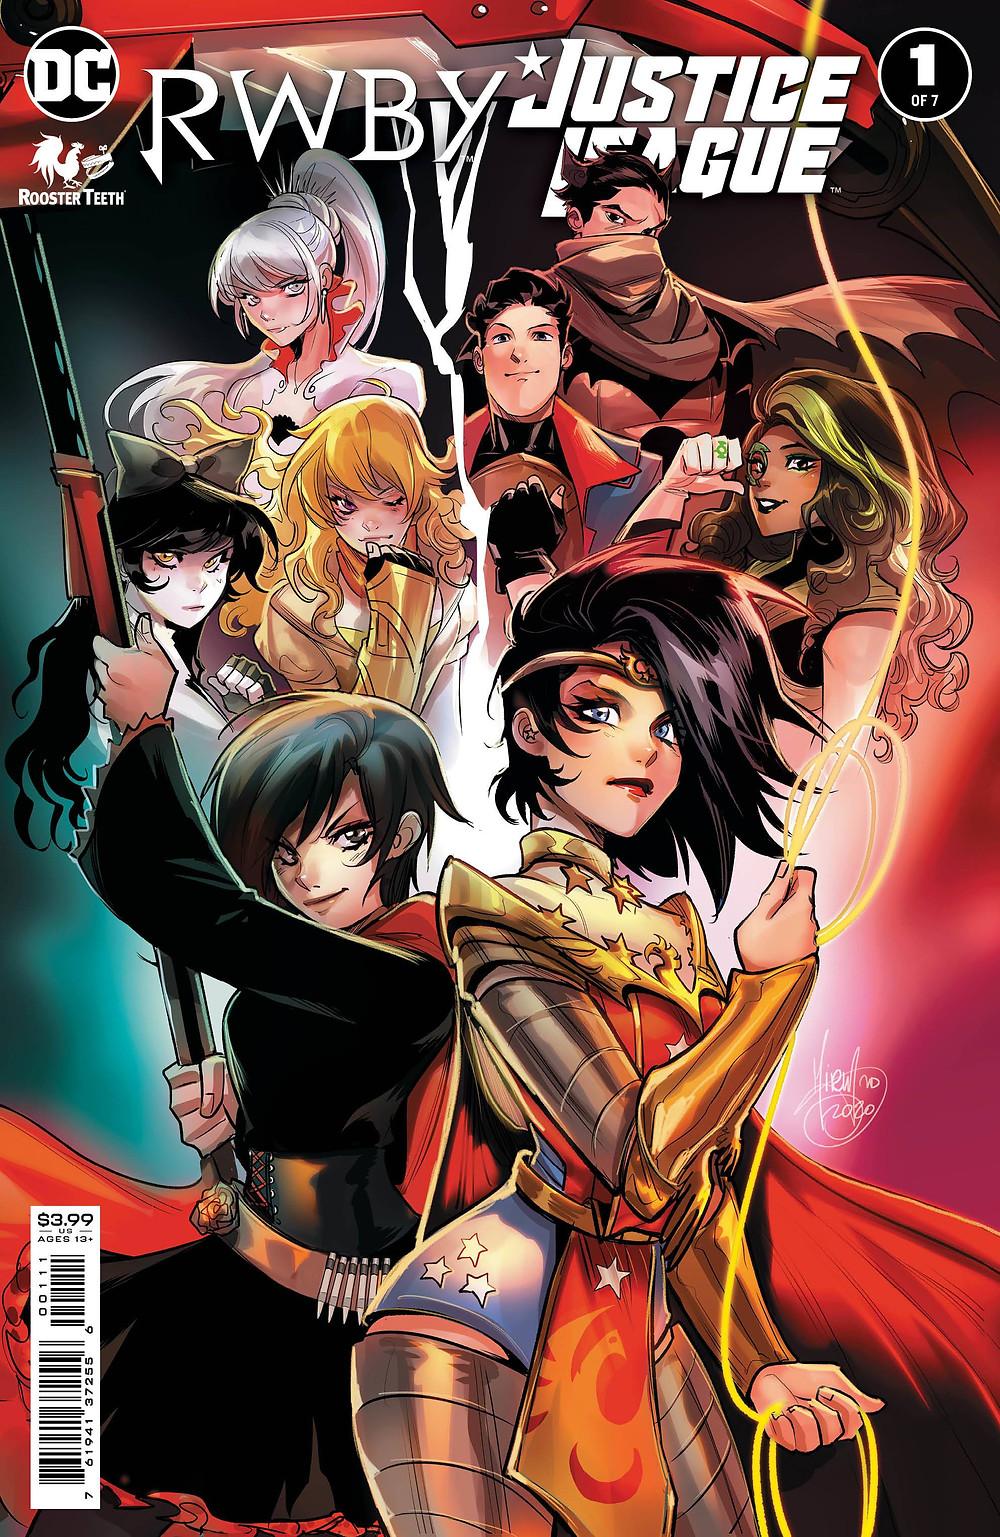 Rwby Justice League #1 cover